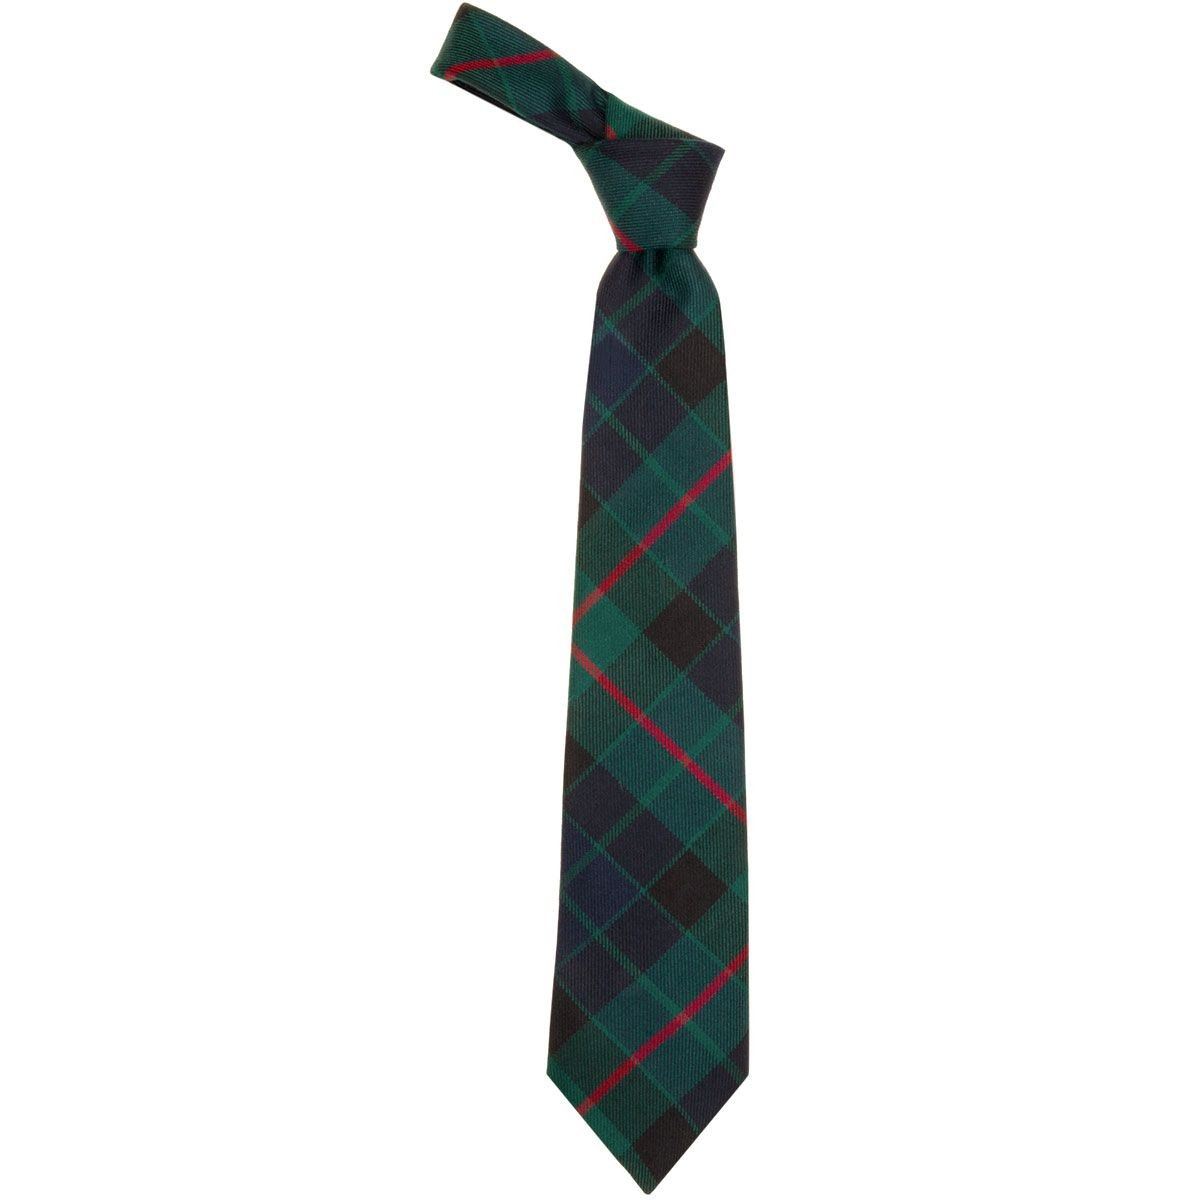 Mens Clan Tie Made in Scotland Shepherd Ancient Tartan